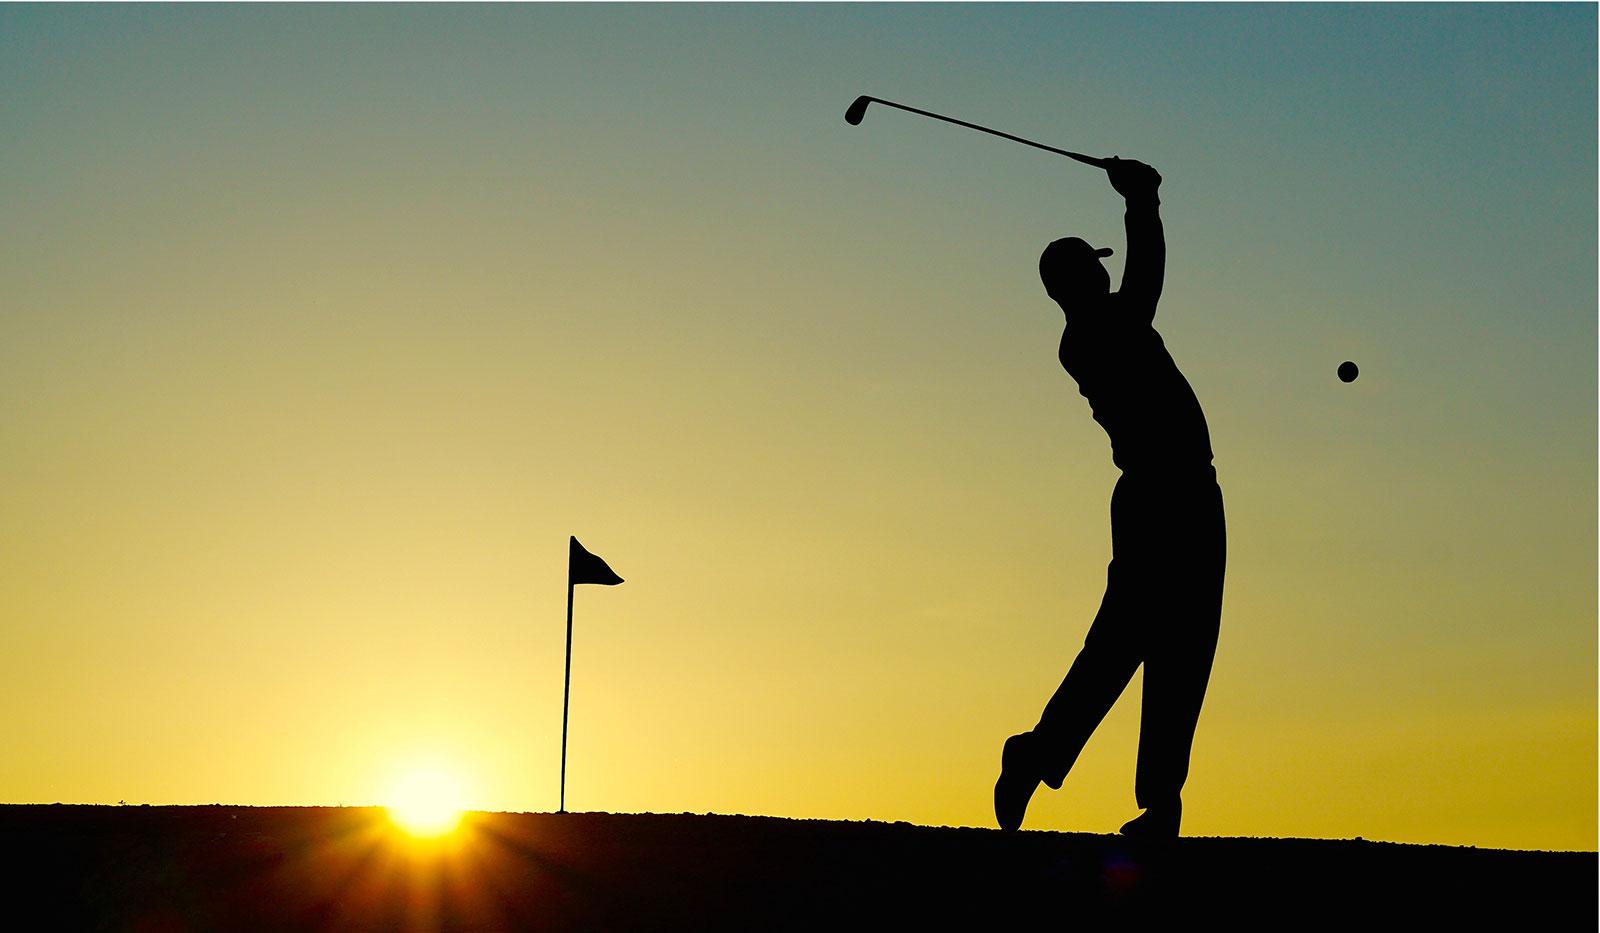 Golfabschlag Sonnenuntergang